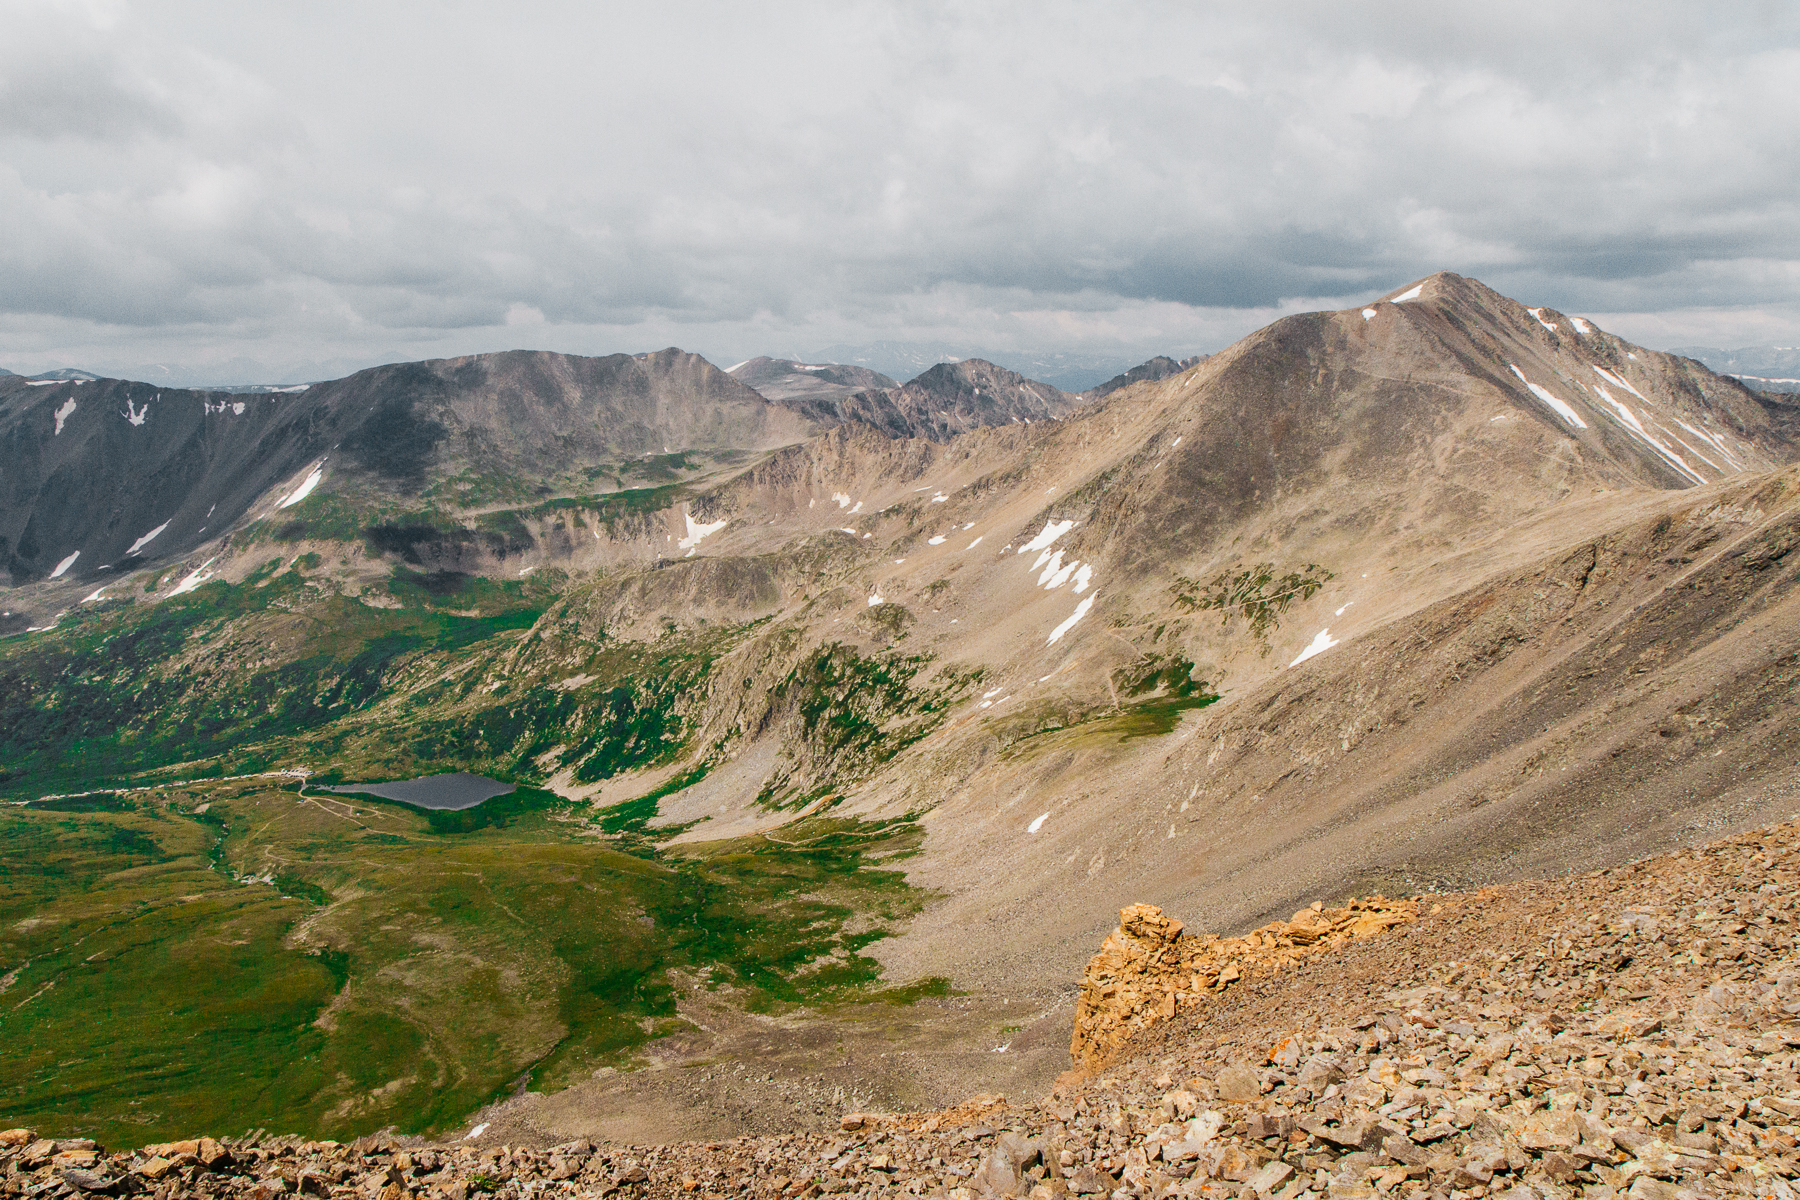 Colorado_14ers__Canon_July17_16.jpg